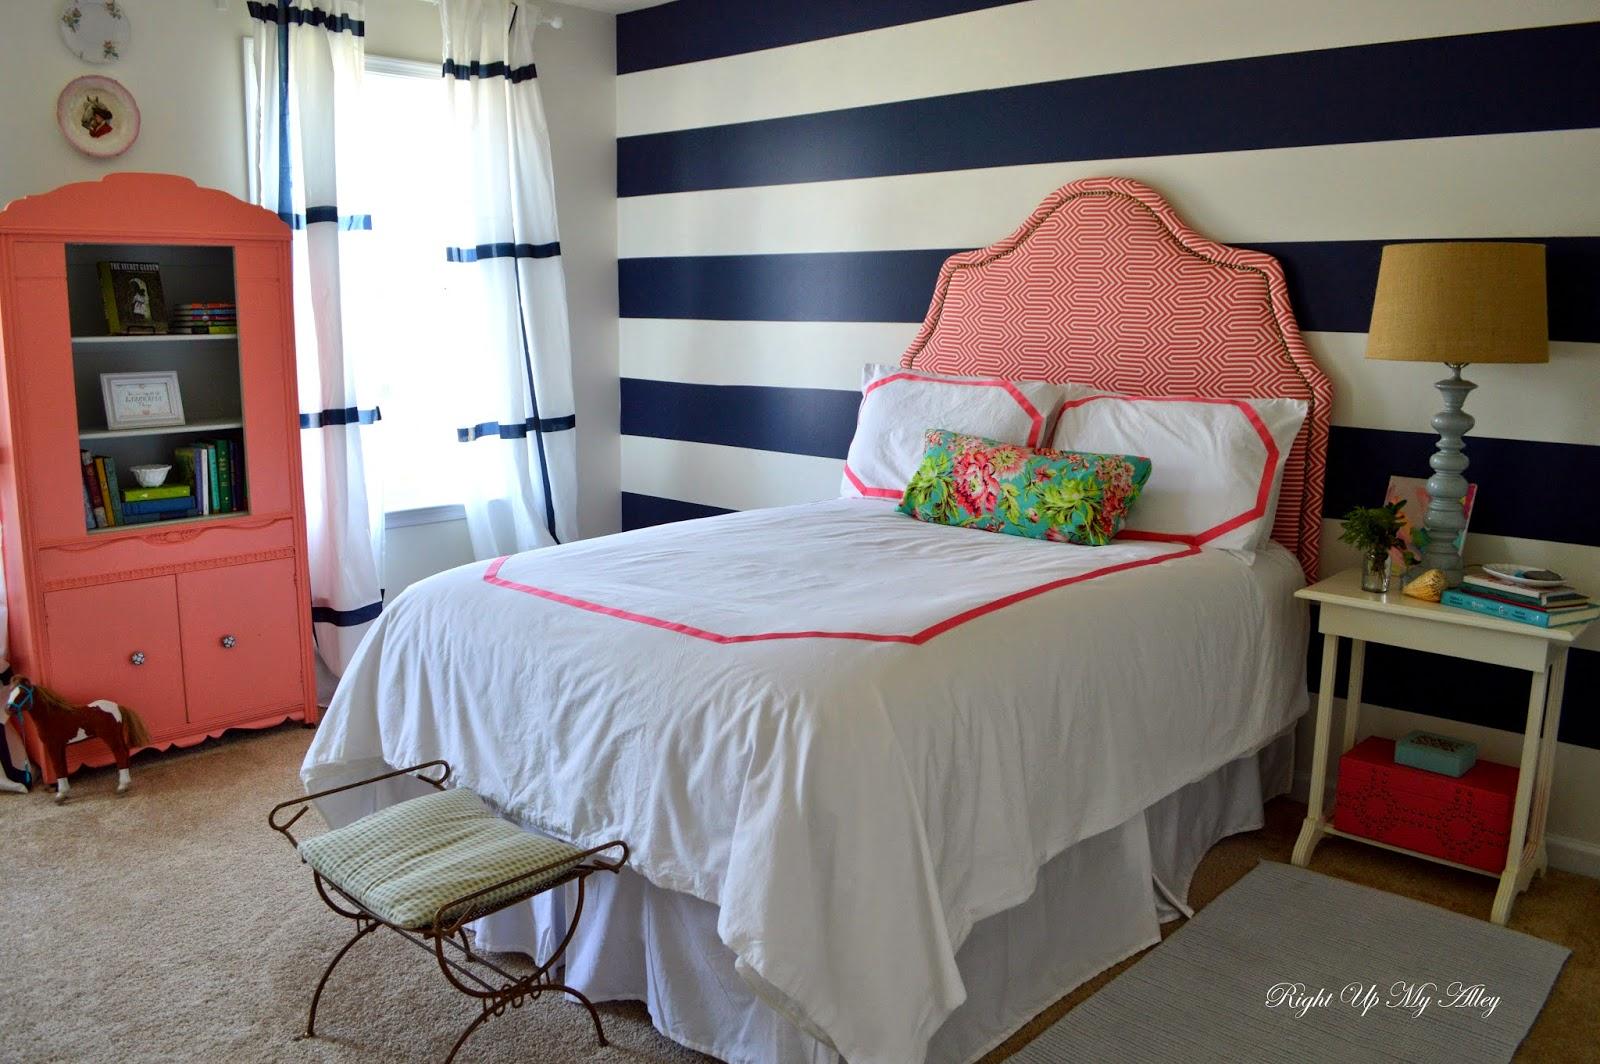 Right Up My Alley: Week 6: Tween Bedroom Makeover Reveal